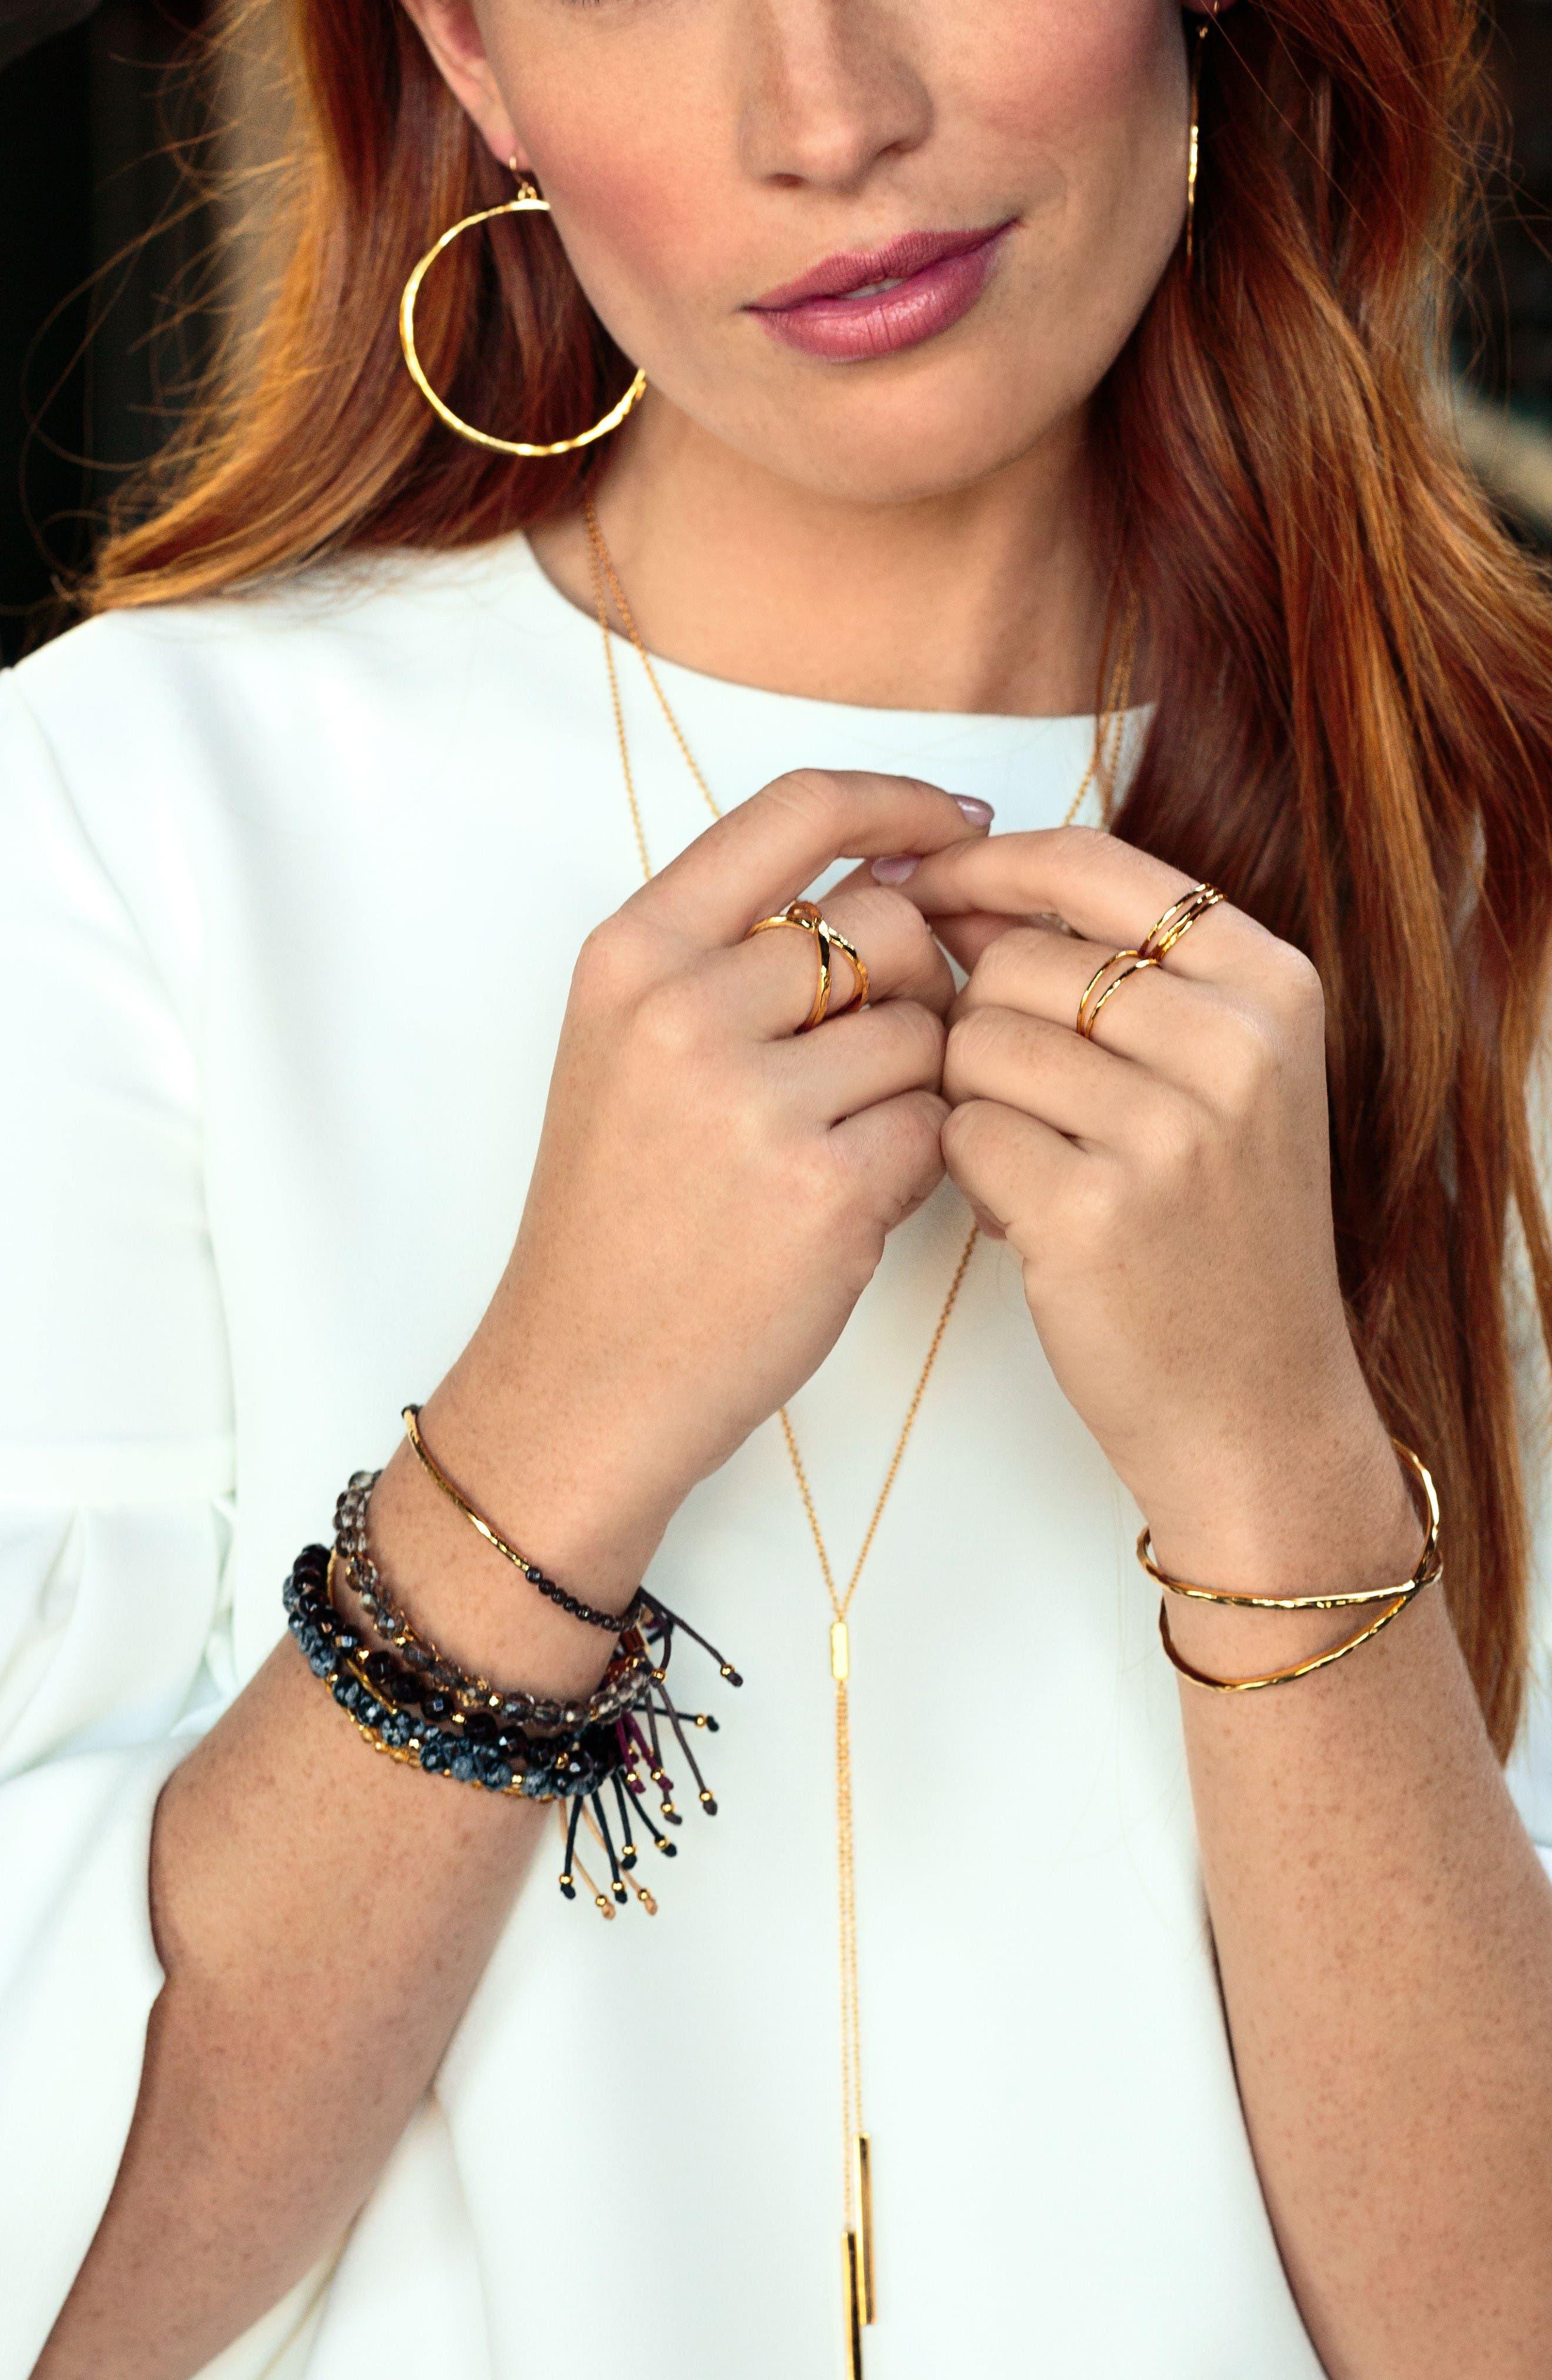 gorjana Earrings, Rings, Bracelets & Necklaces